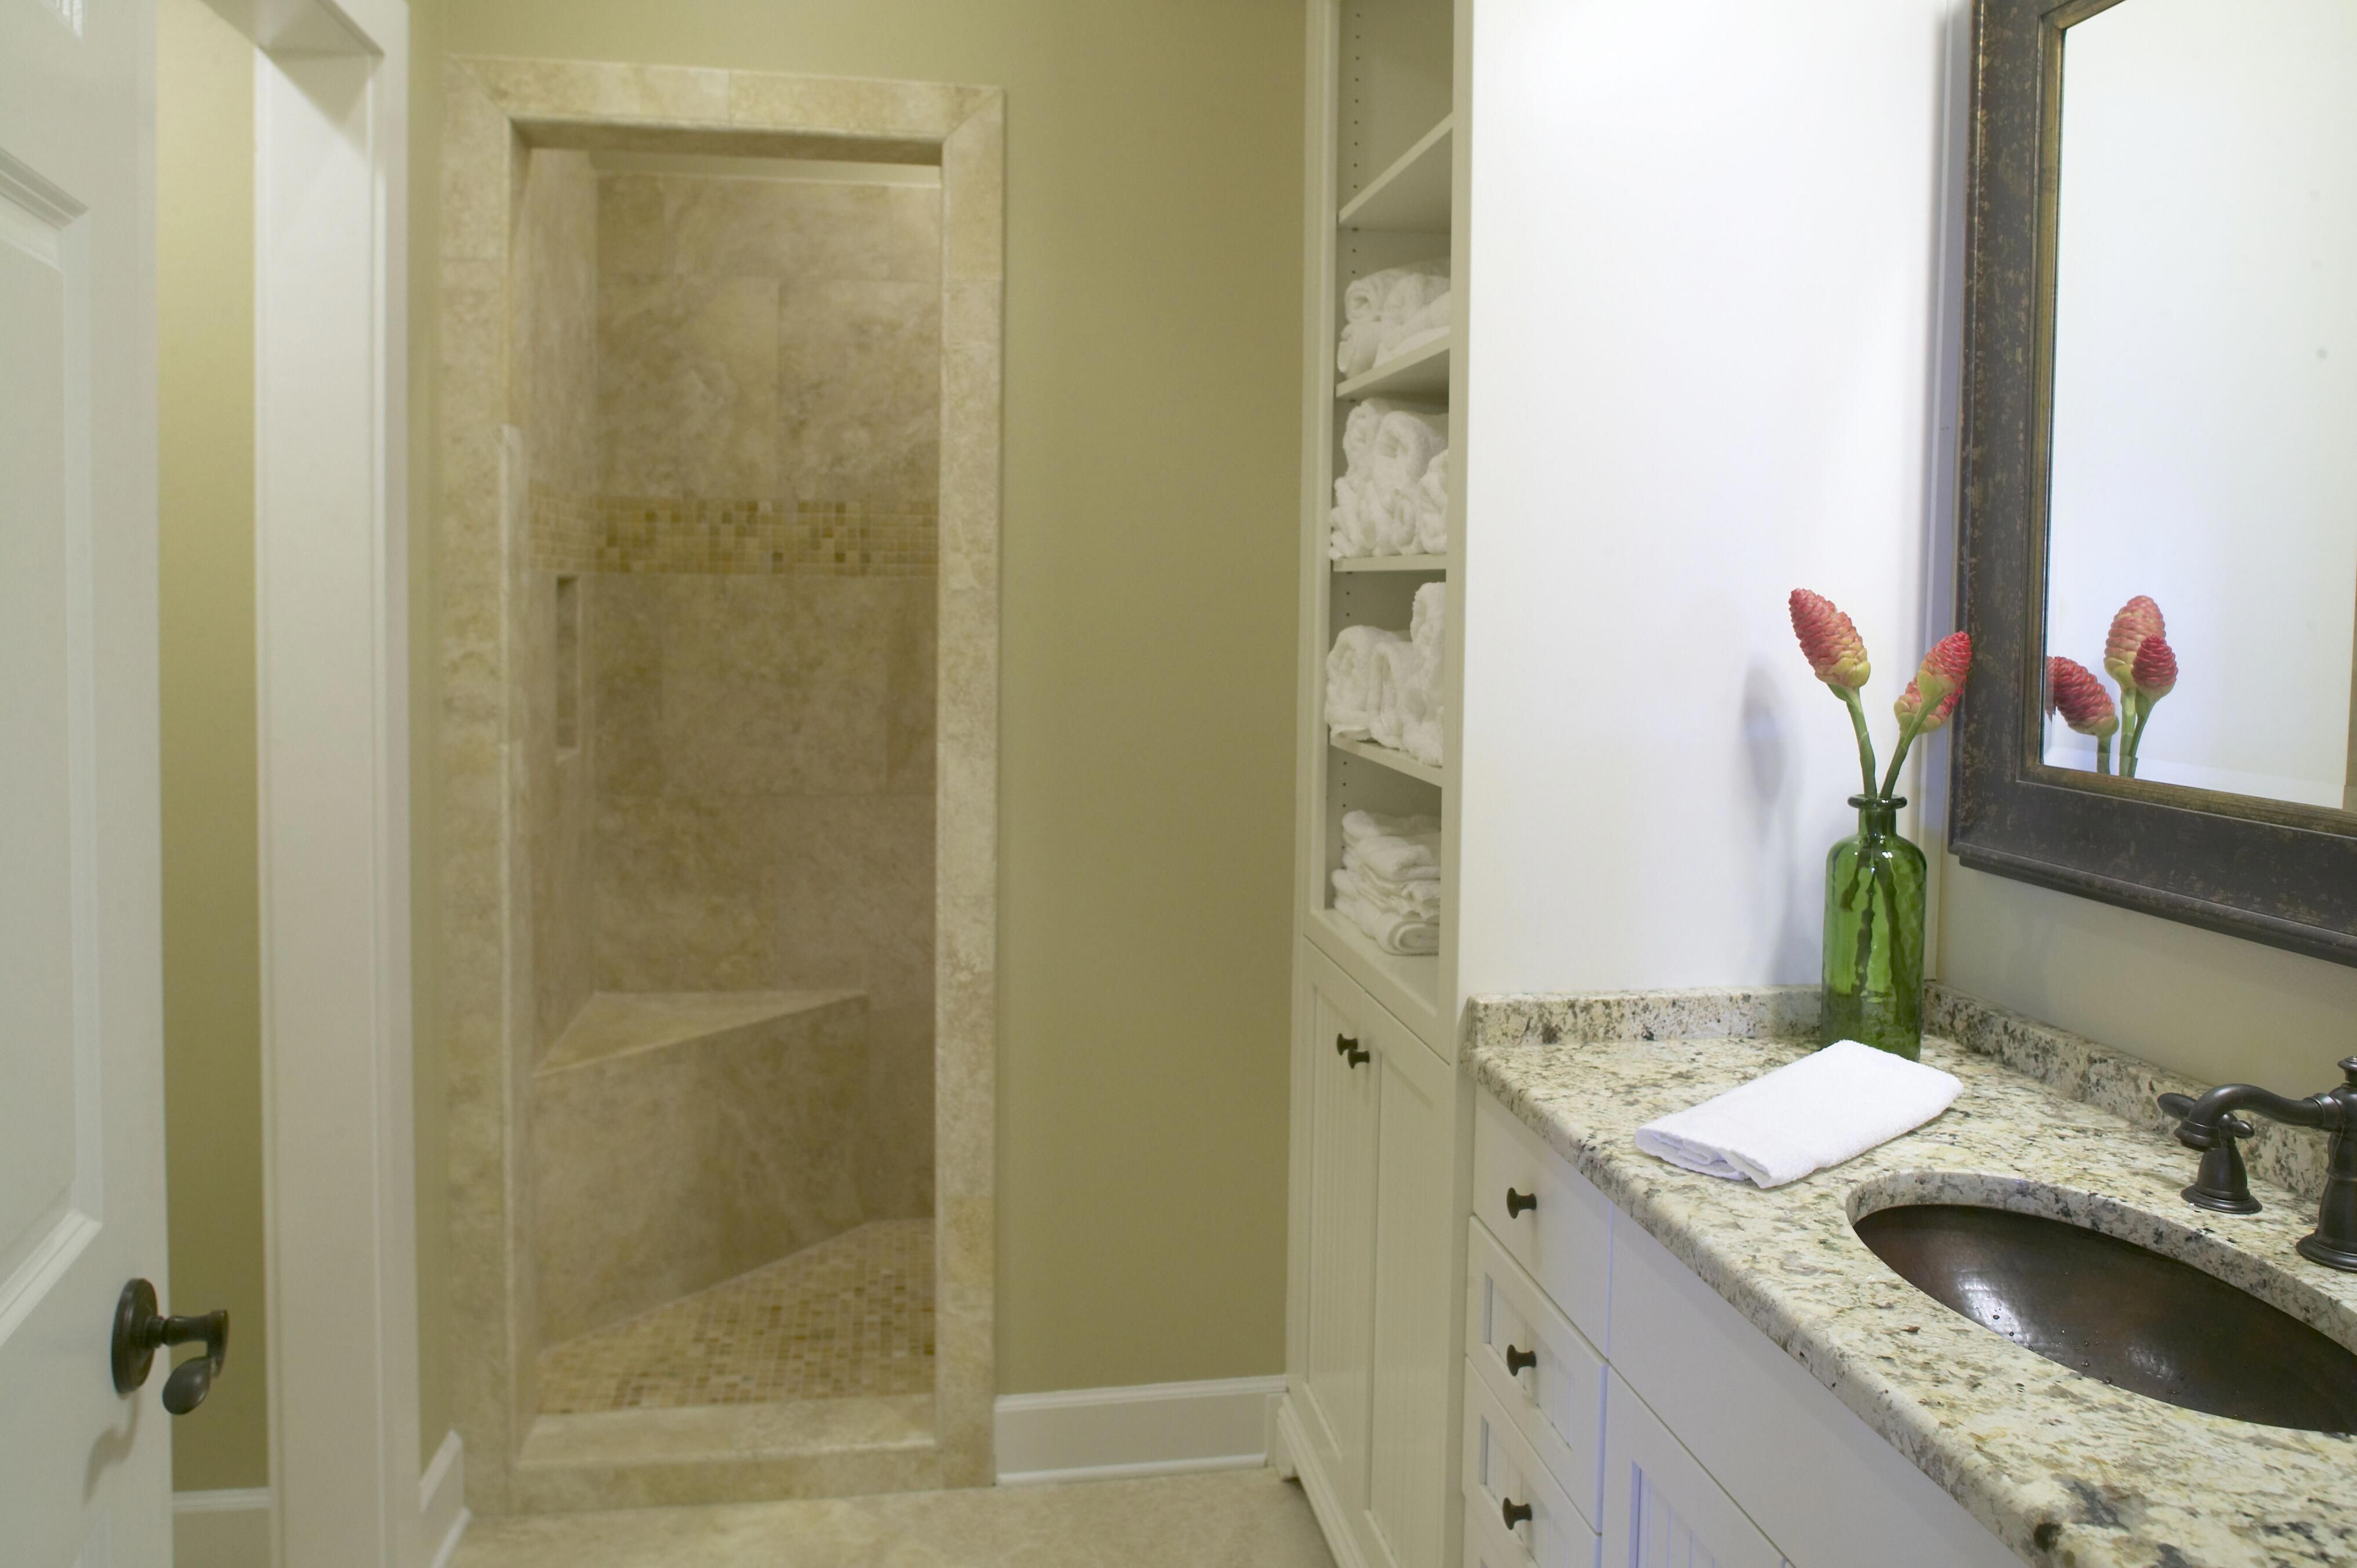 Simple Bathroom Decor With Low Cost Bath Linens Storage ...